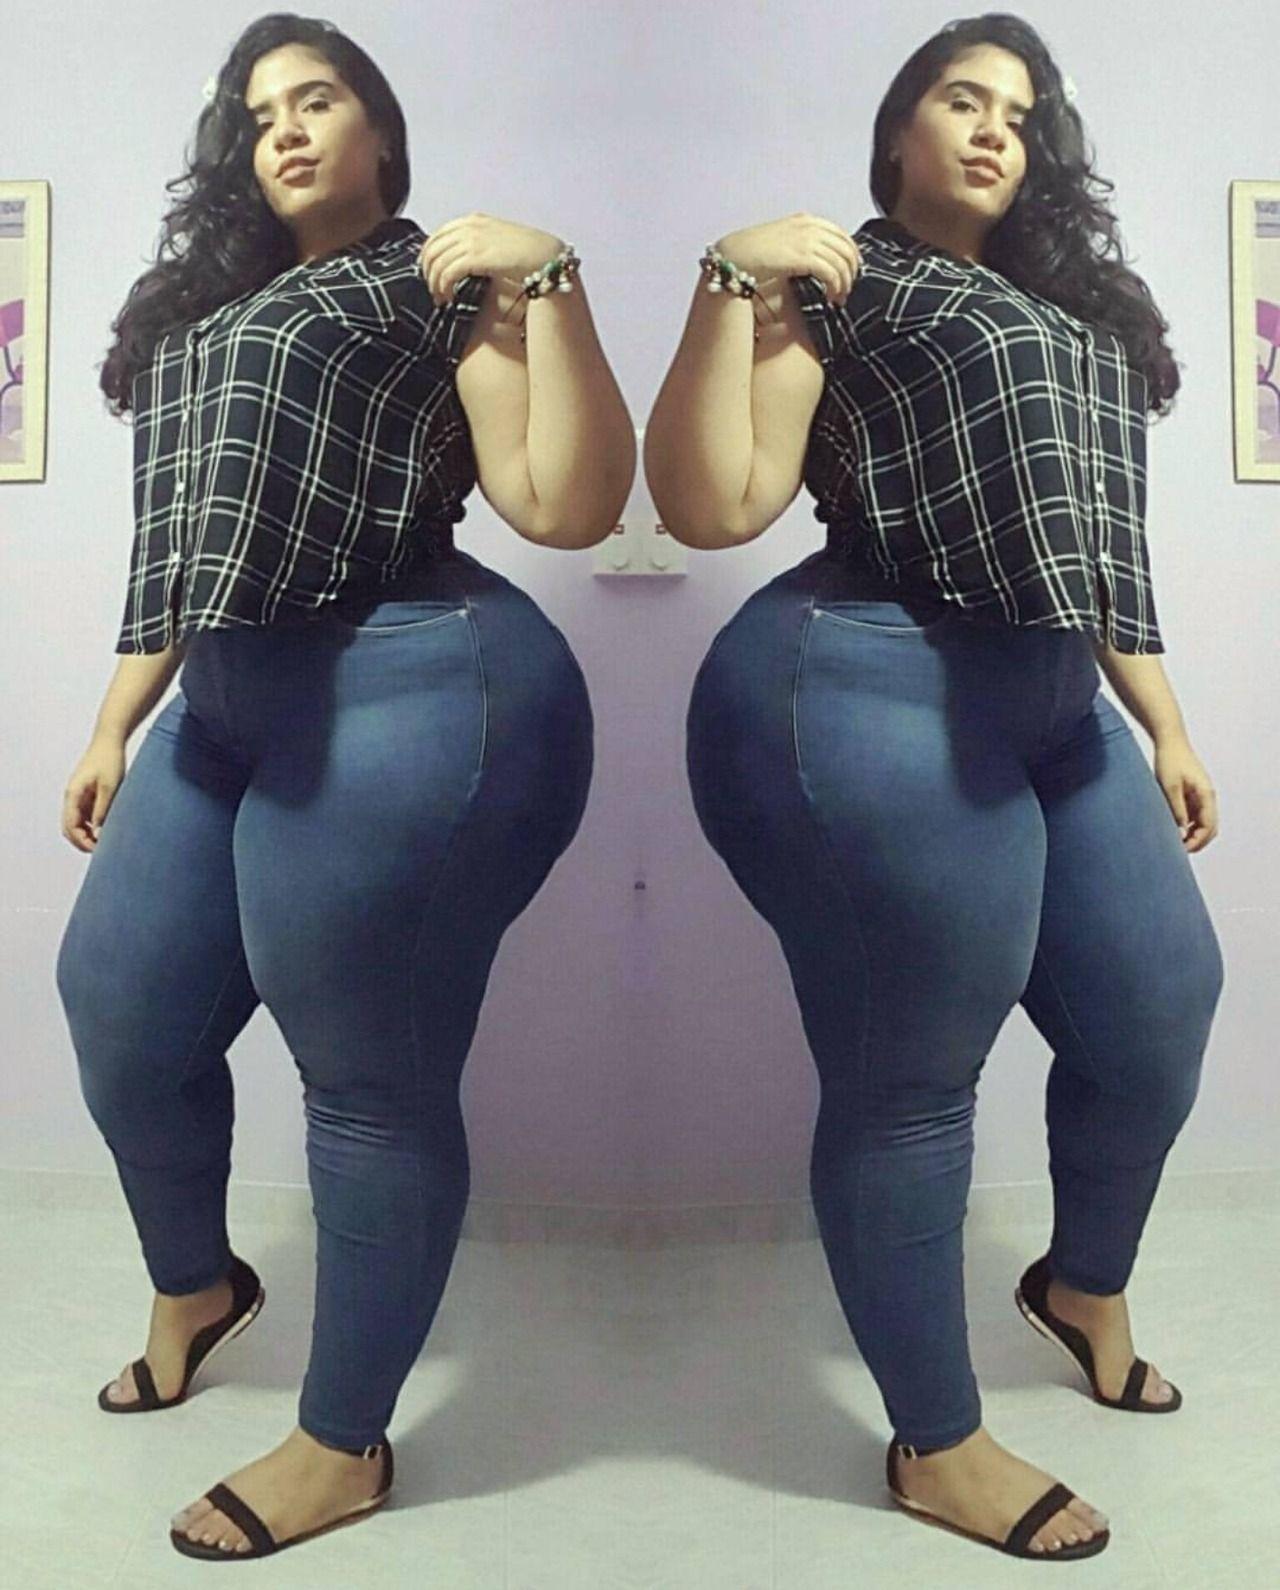 Sexy Latina Feet Tumblr Amazing 100%beef : photo | bel fanm | pinterest | curvy, curves and big